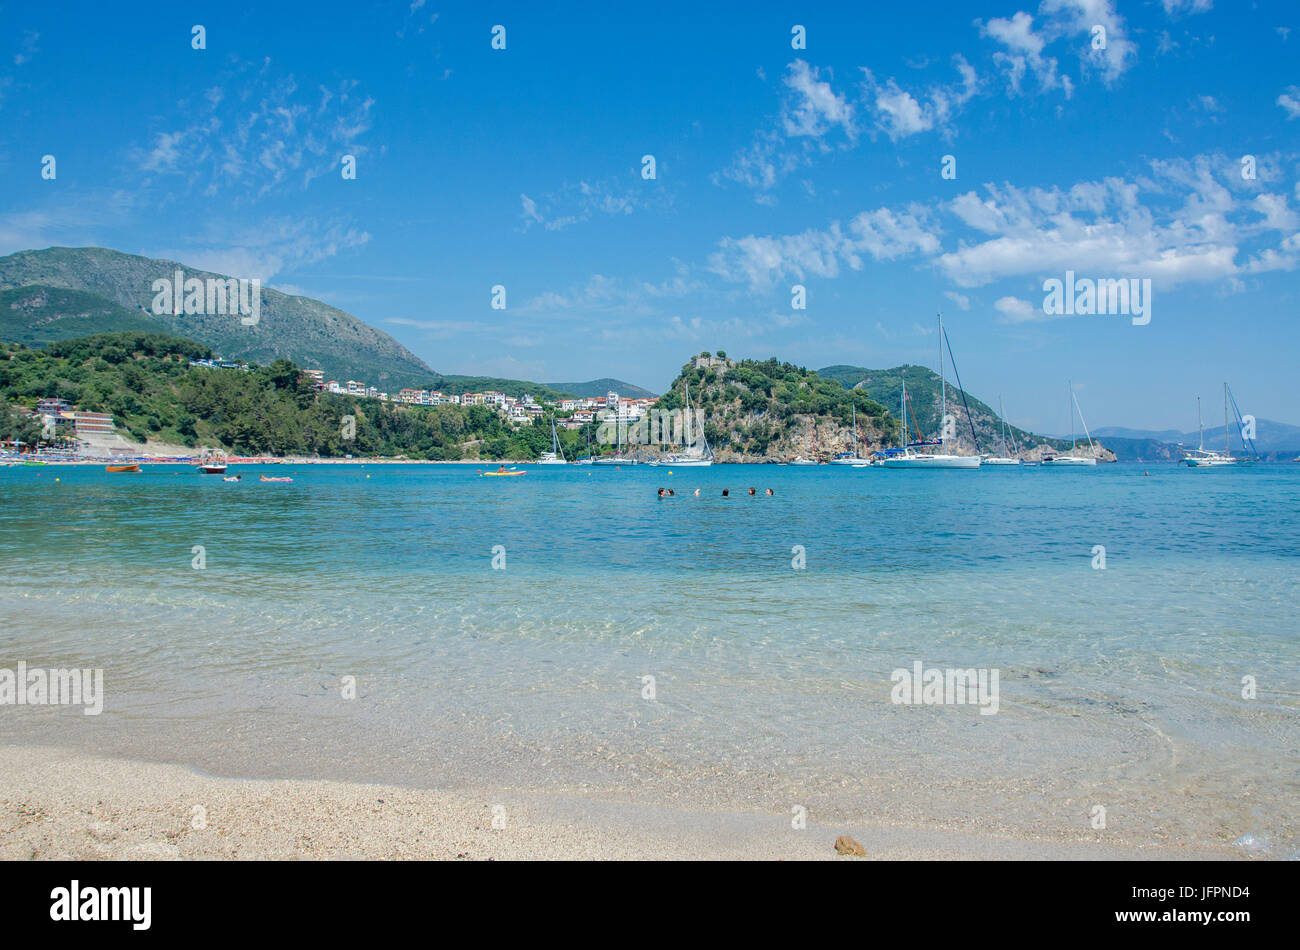 Beach Scene - Valtos Beach - Ionian Sea - Parga, Greece - Stock Image